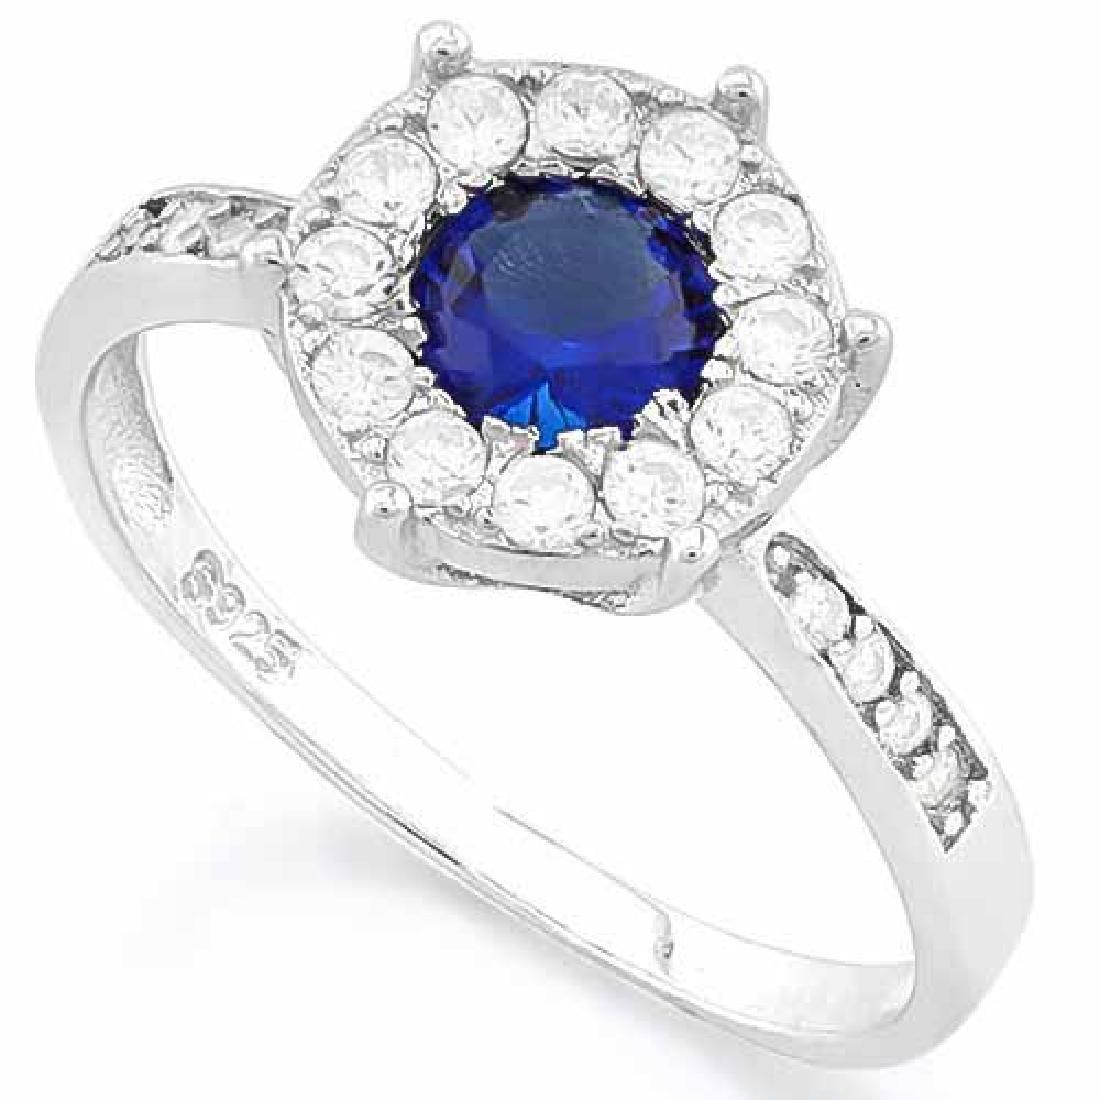 1 CARAT CREATED BLUE SAPPHIRE & 1/4 CARAT (24 PCS) FLAW